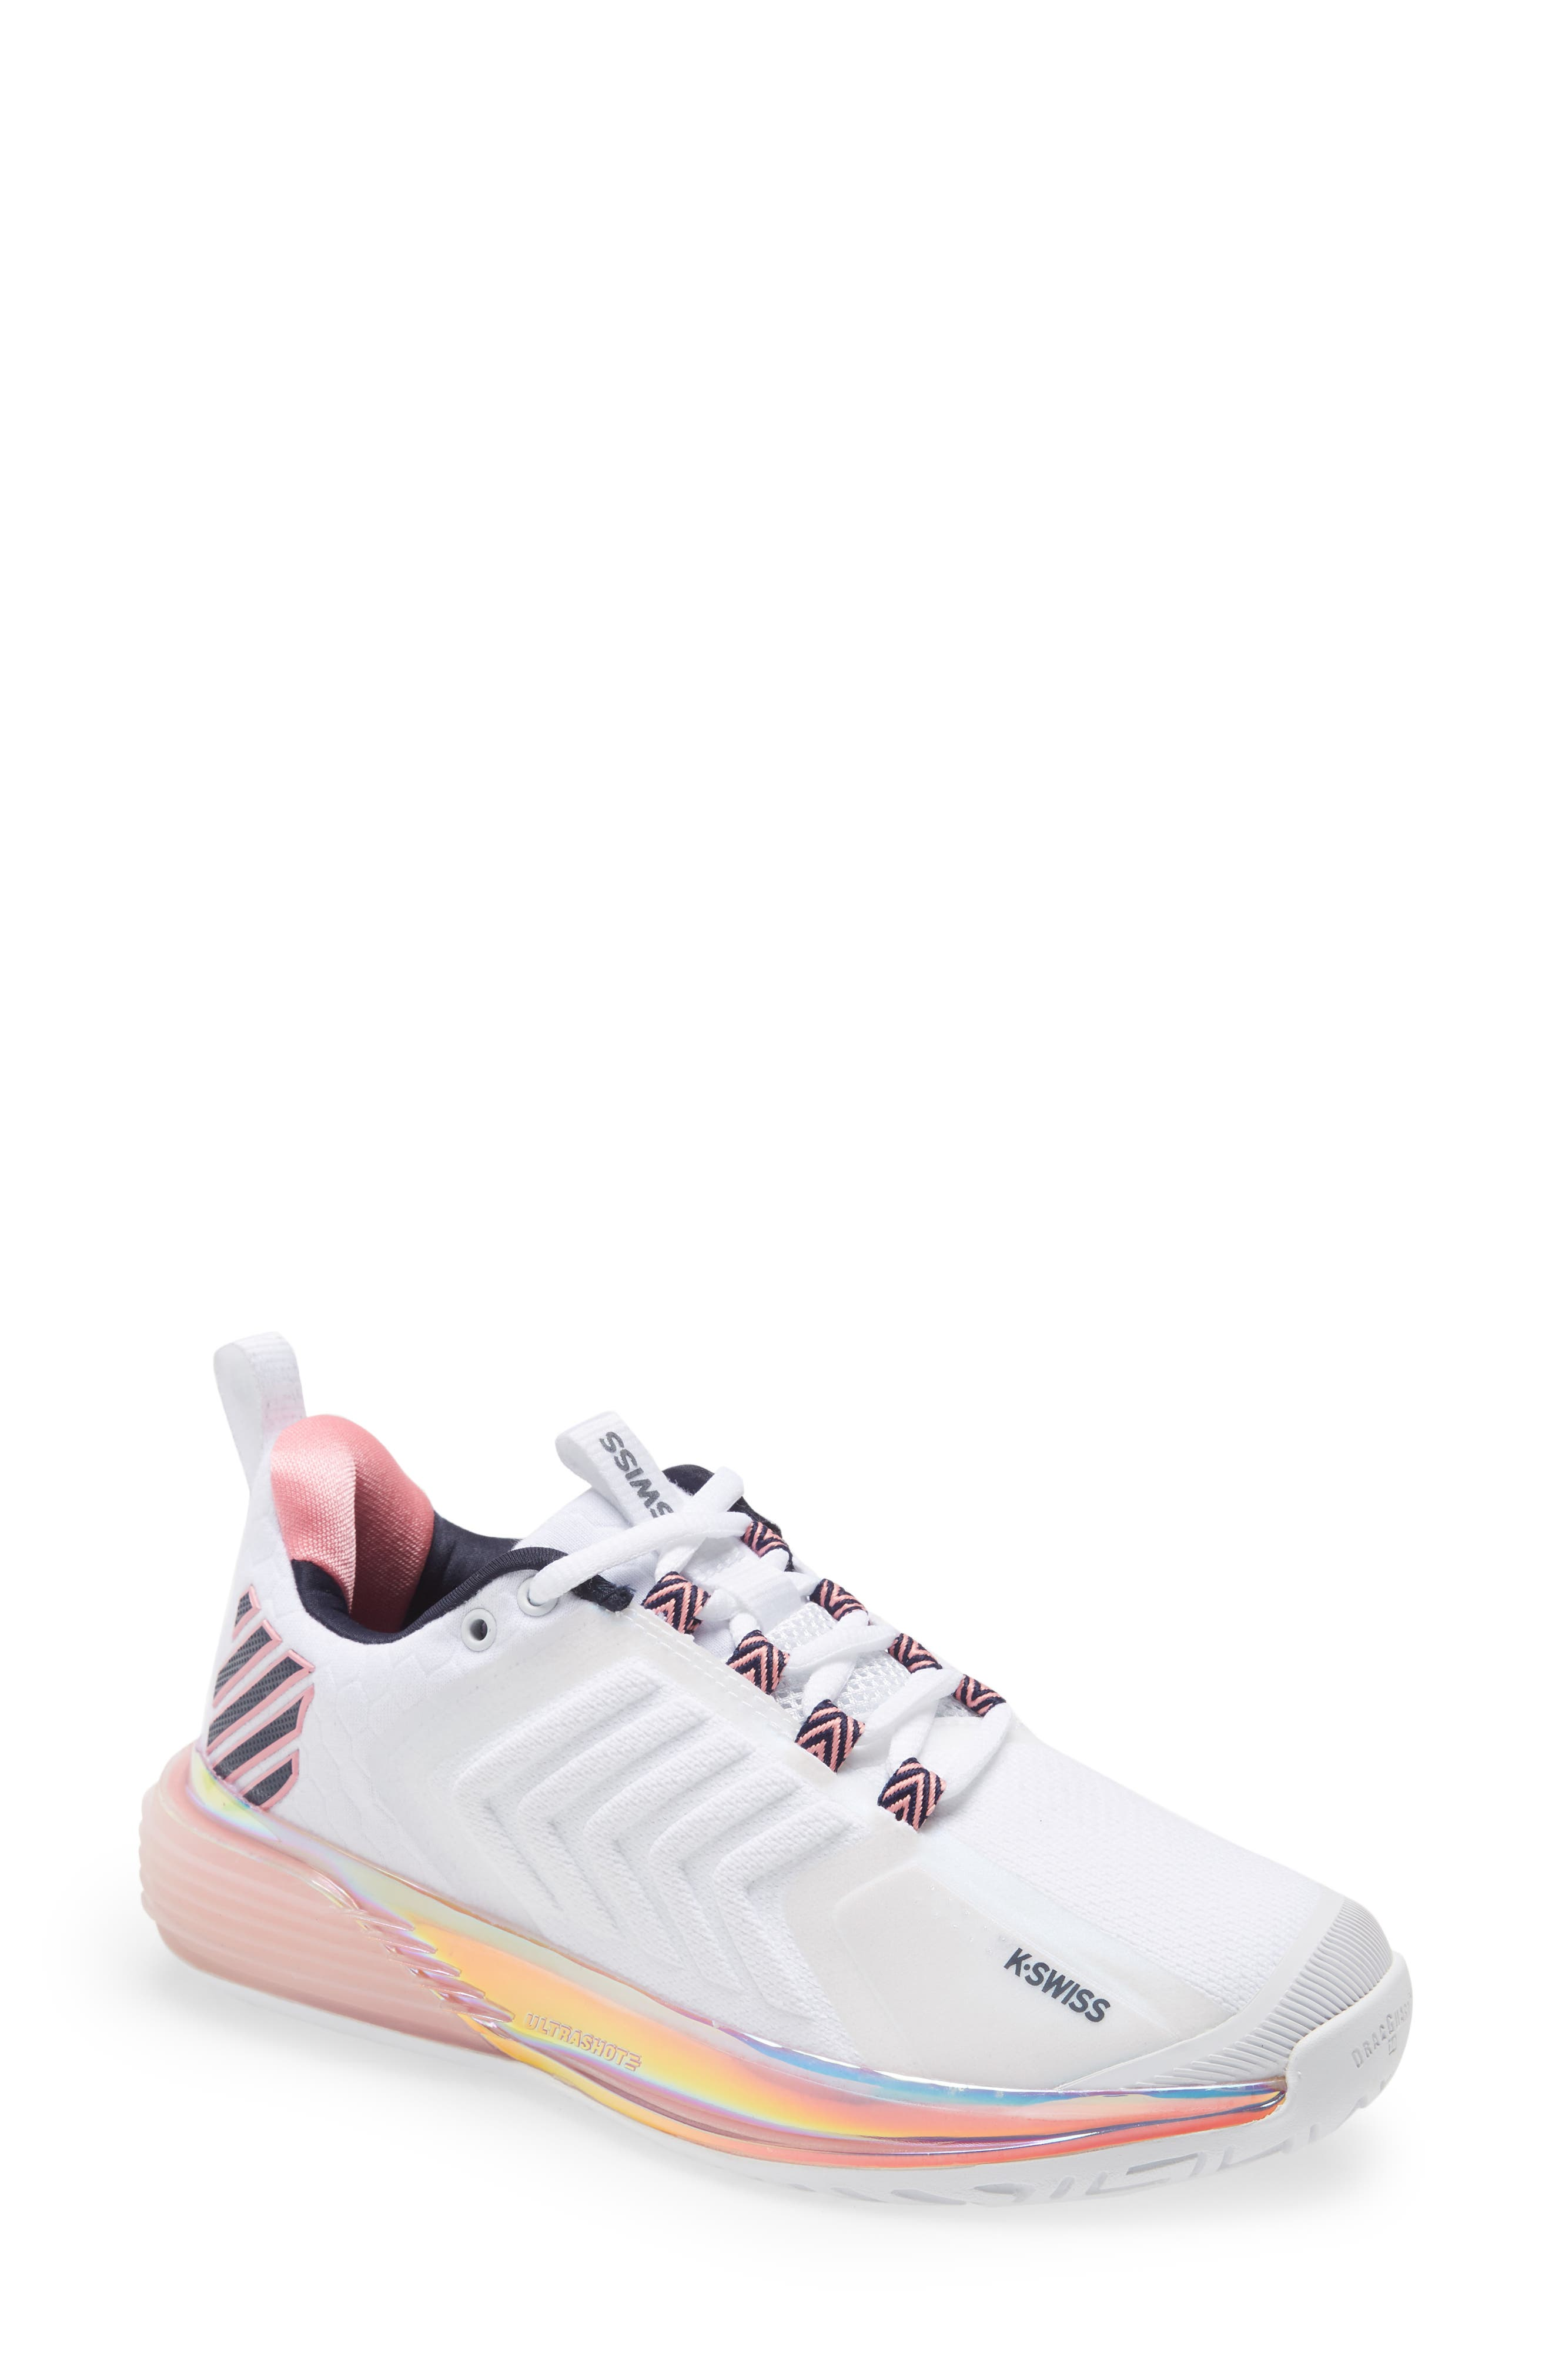 Ultrashot 3 X Eleven Glow Tennis Shoe